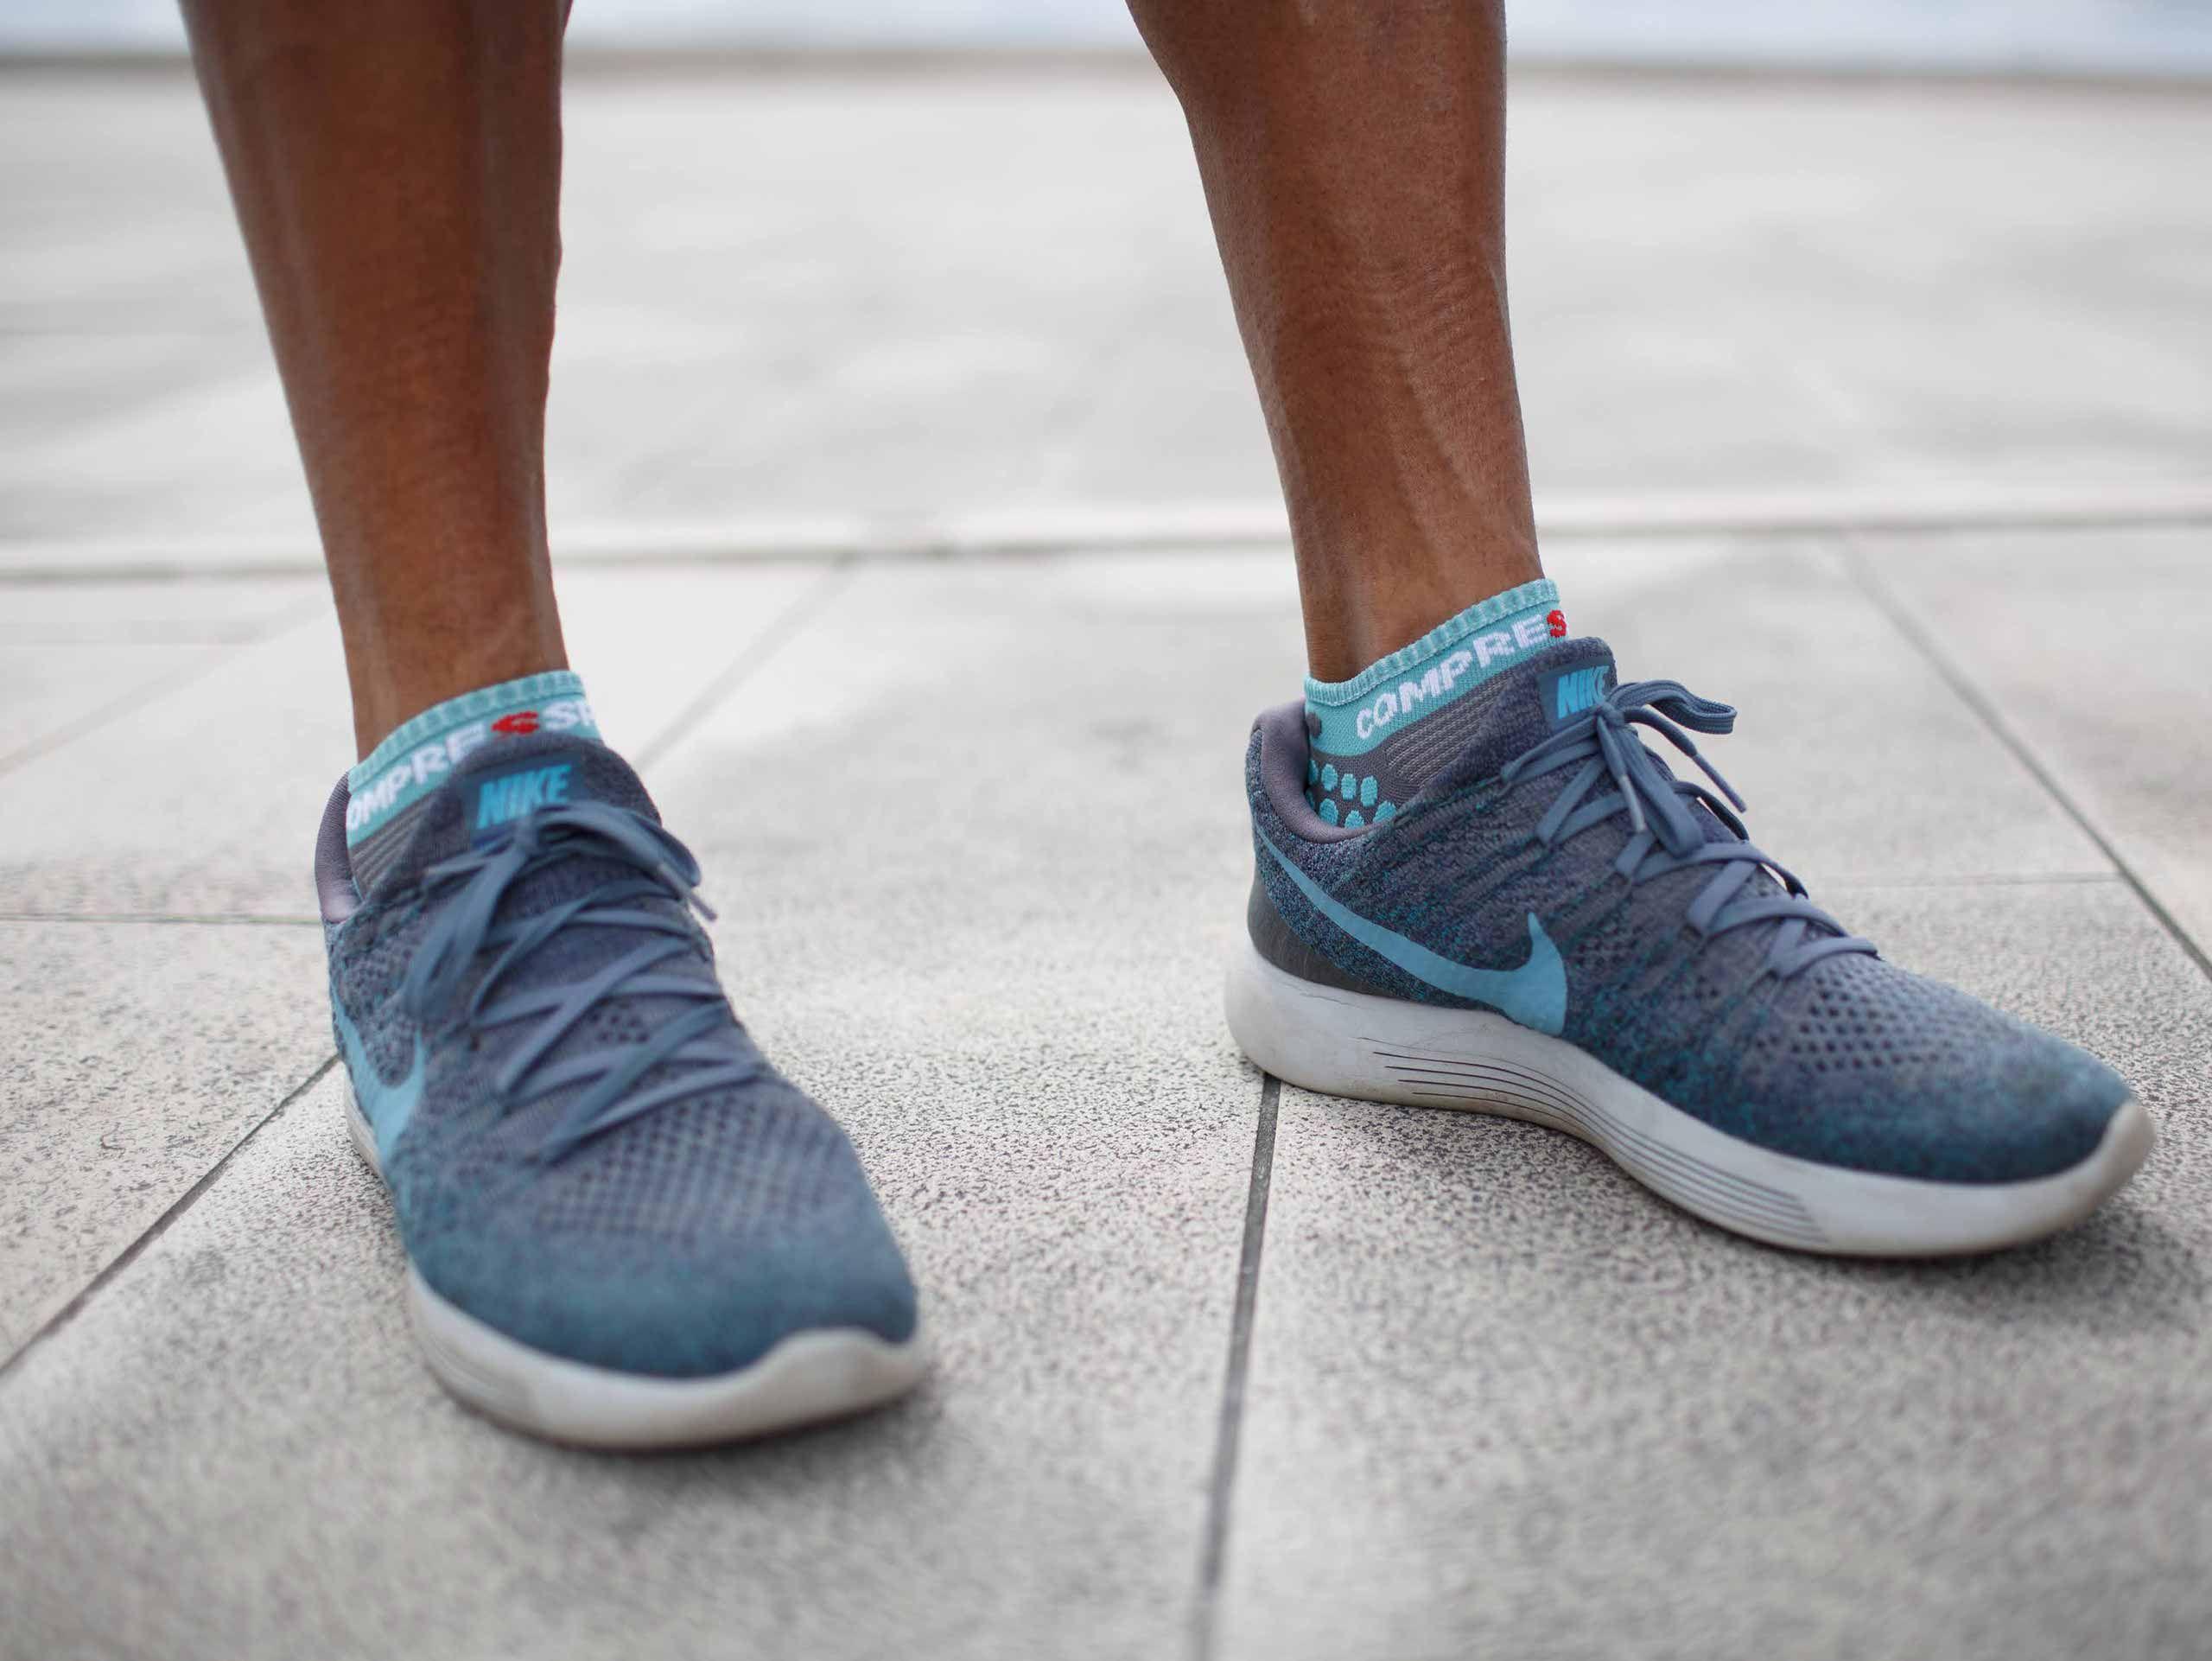 Pro Racing Socks v3.0 Run Low NILE BLUE